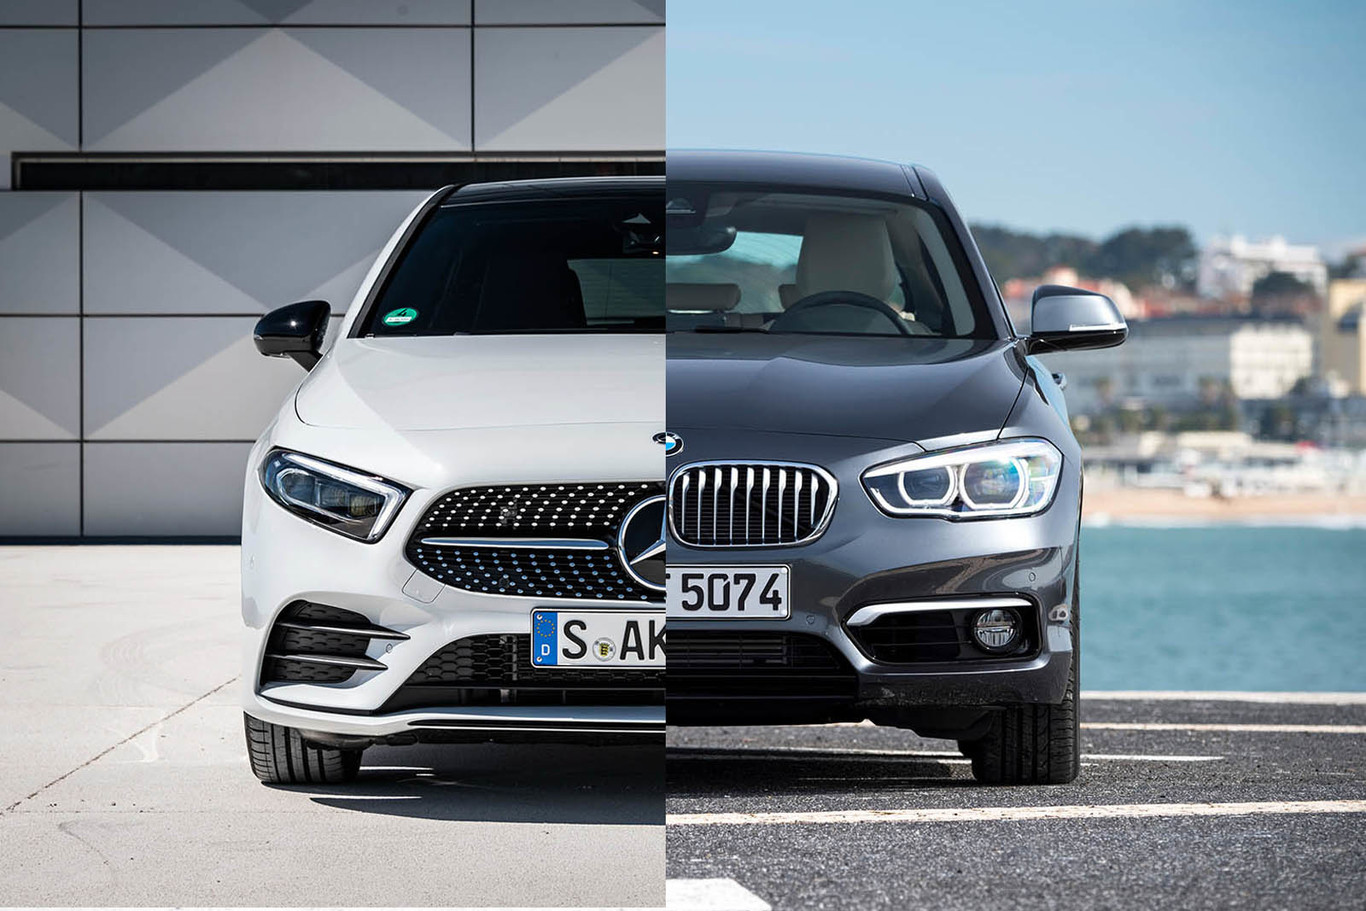 Comparativa Mercedes Clase A Vs Bmw Serie 1 Cual Es Mejor